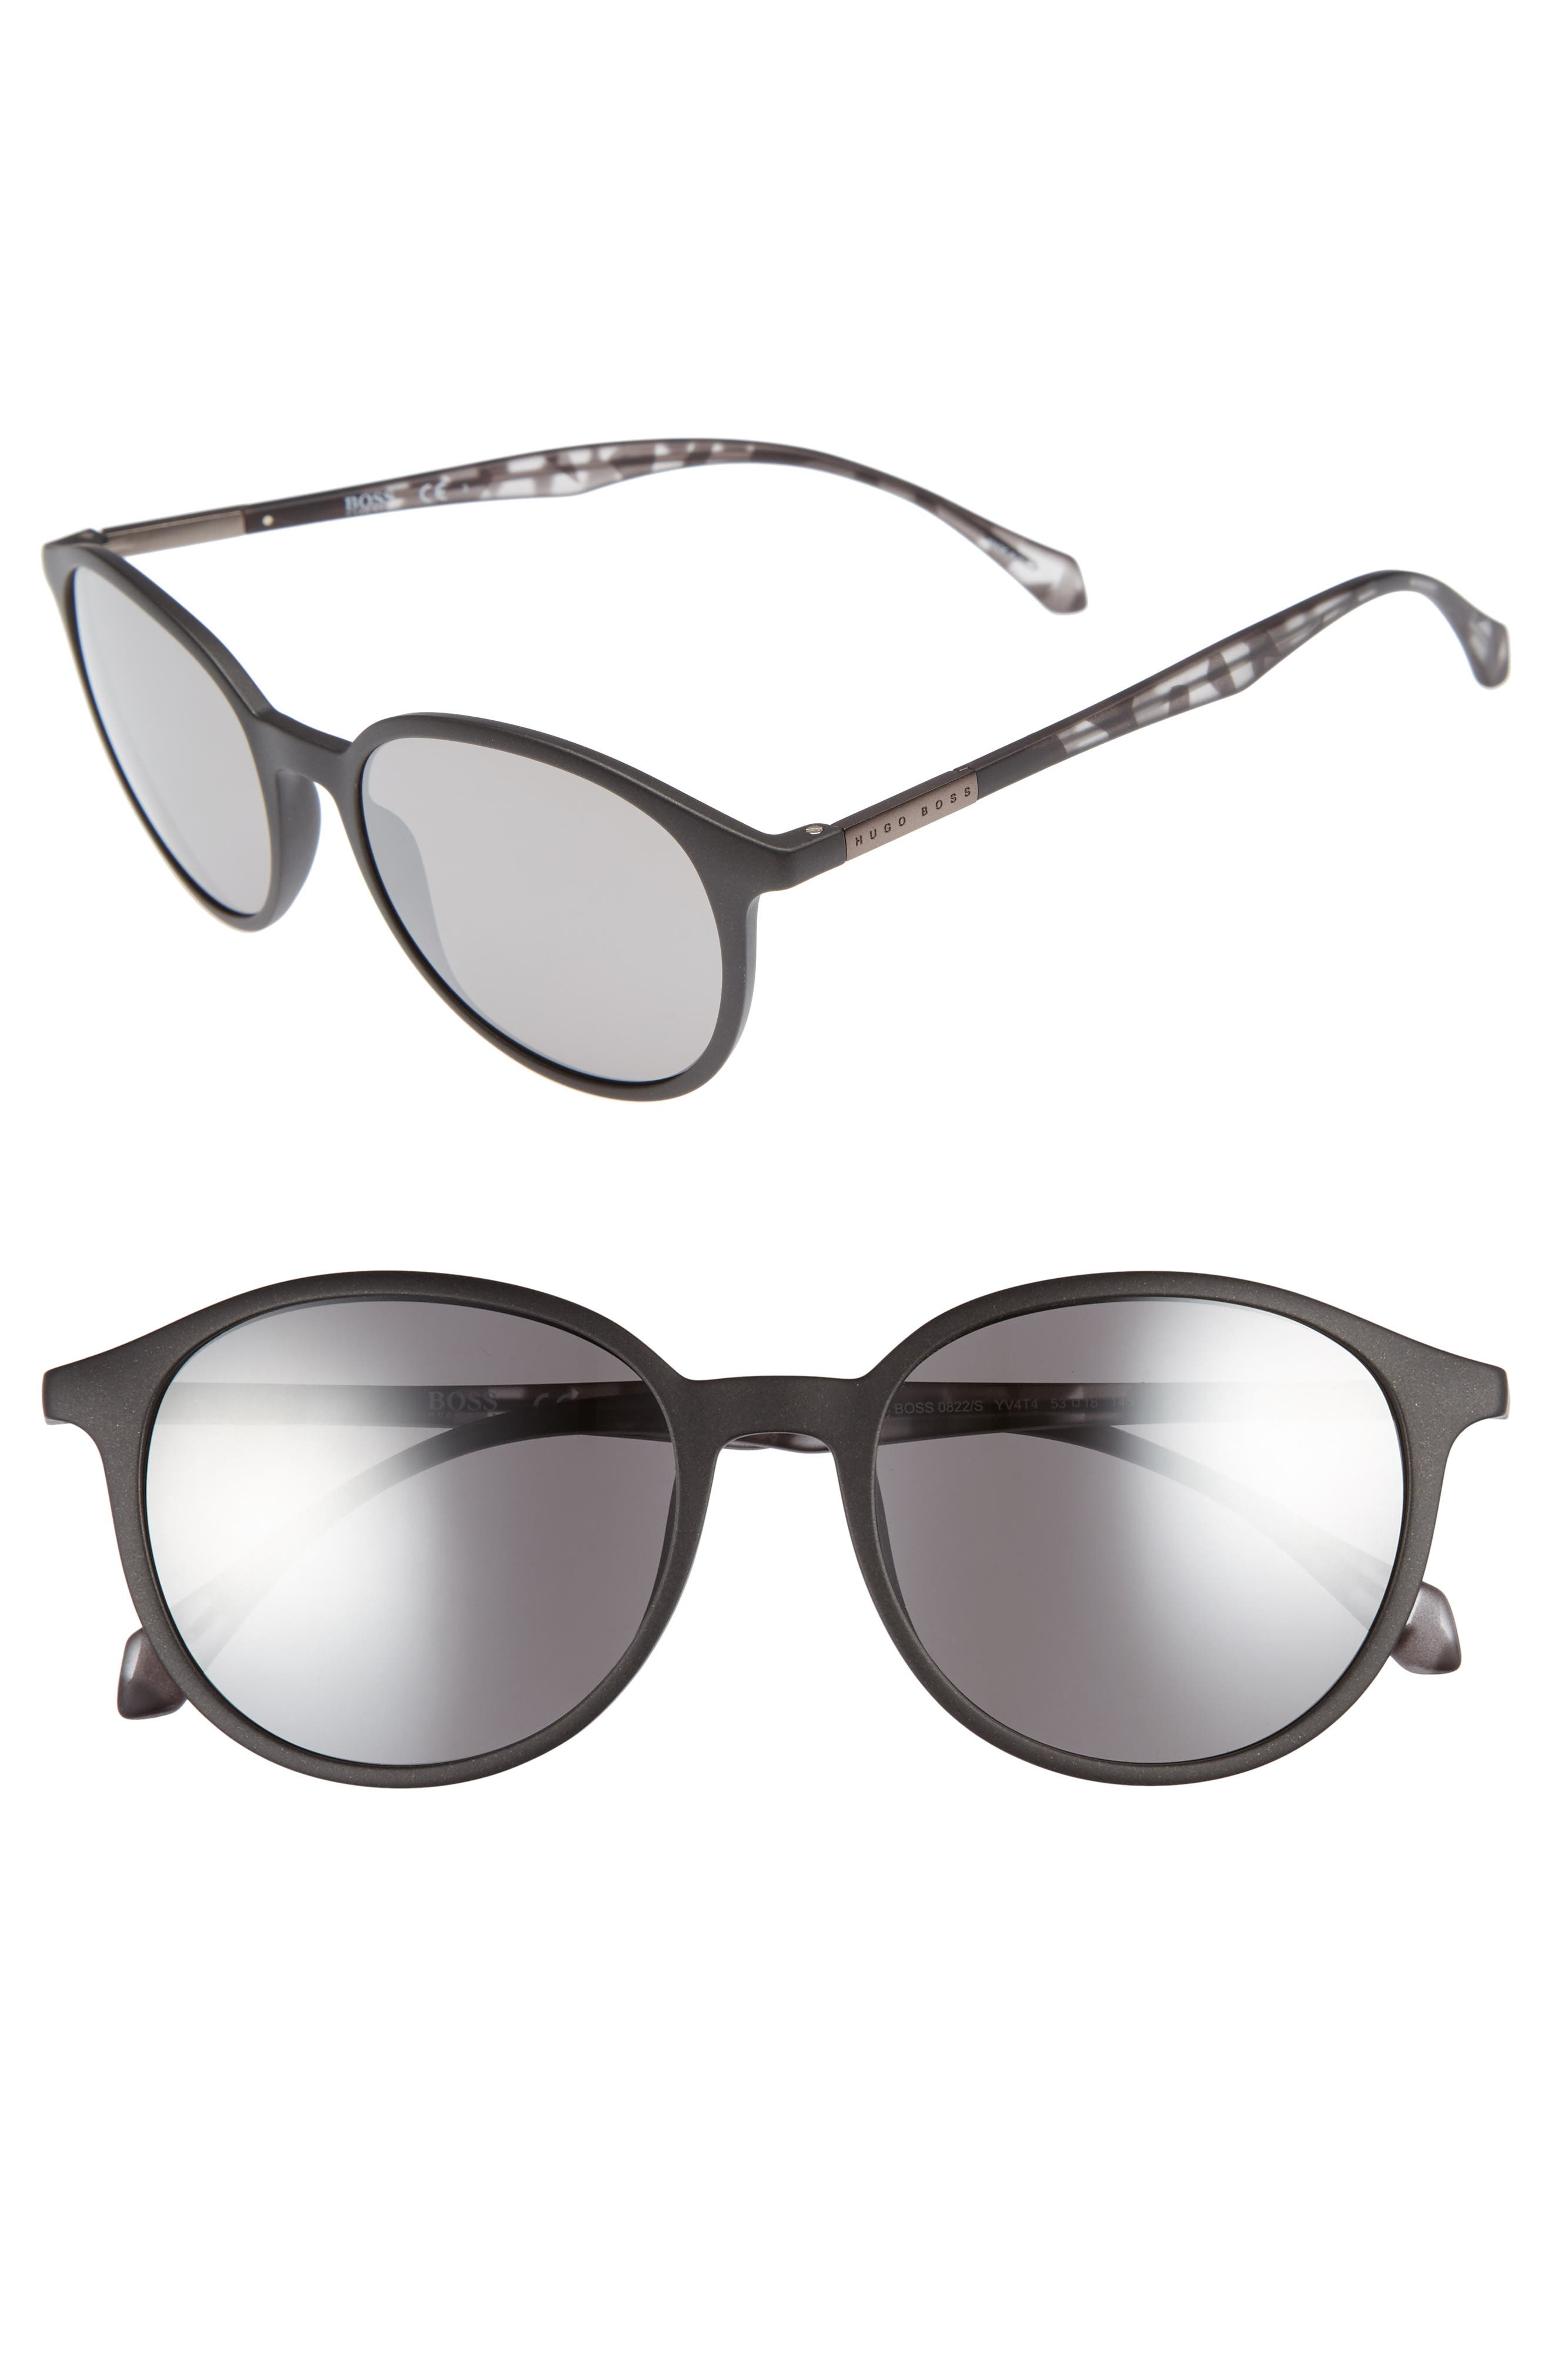 53mm Sunglasses,                         Main,                         color, Black Grey Havana